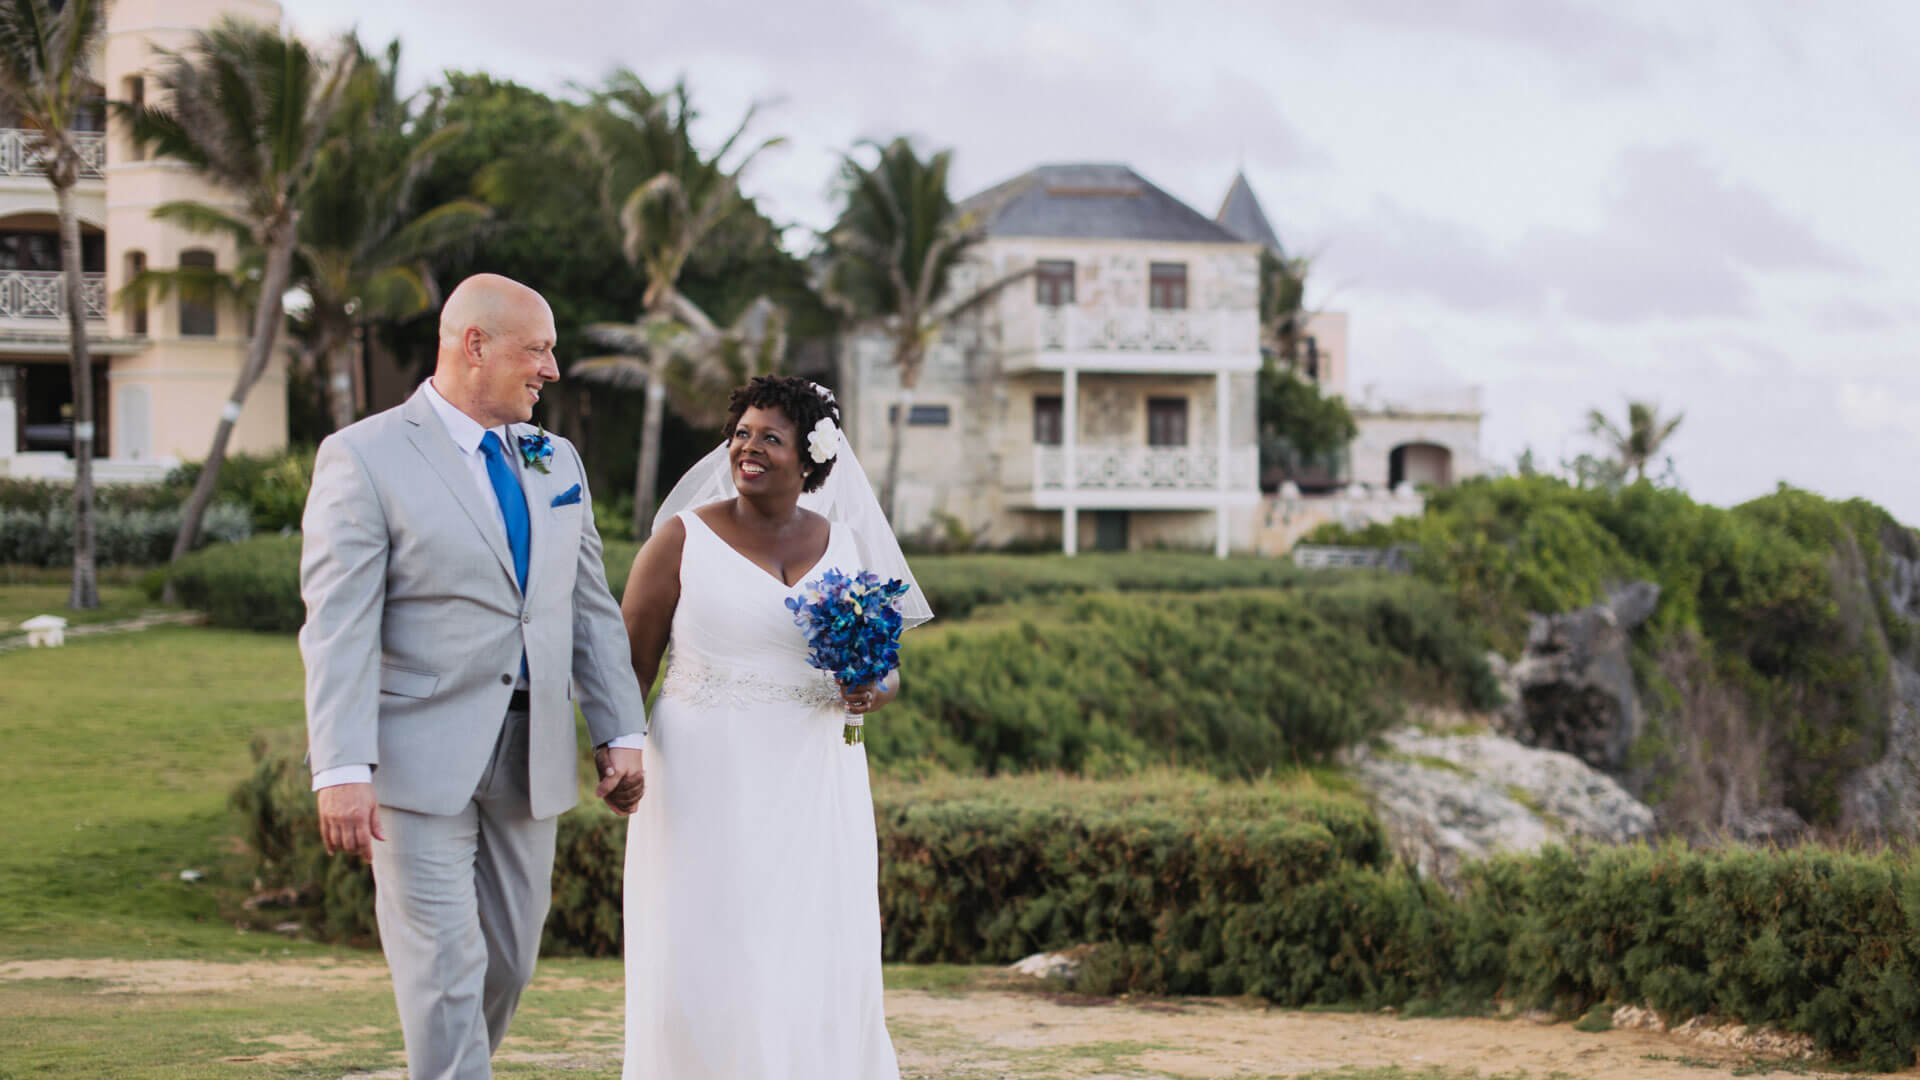 Weddings at The Crane (17)